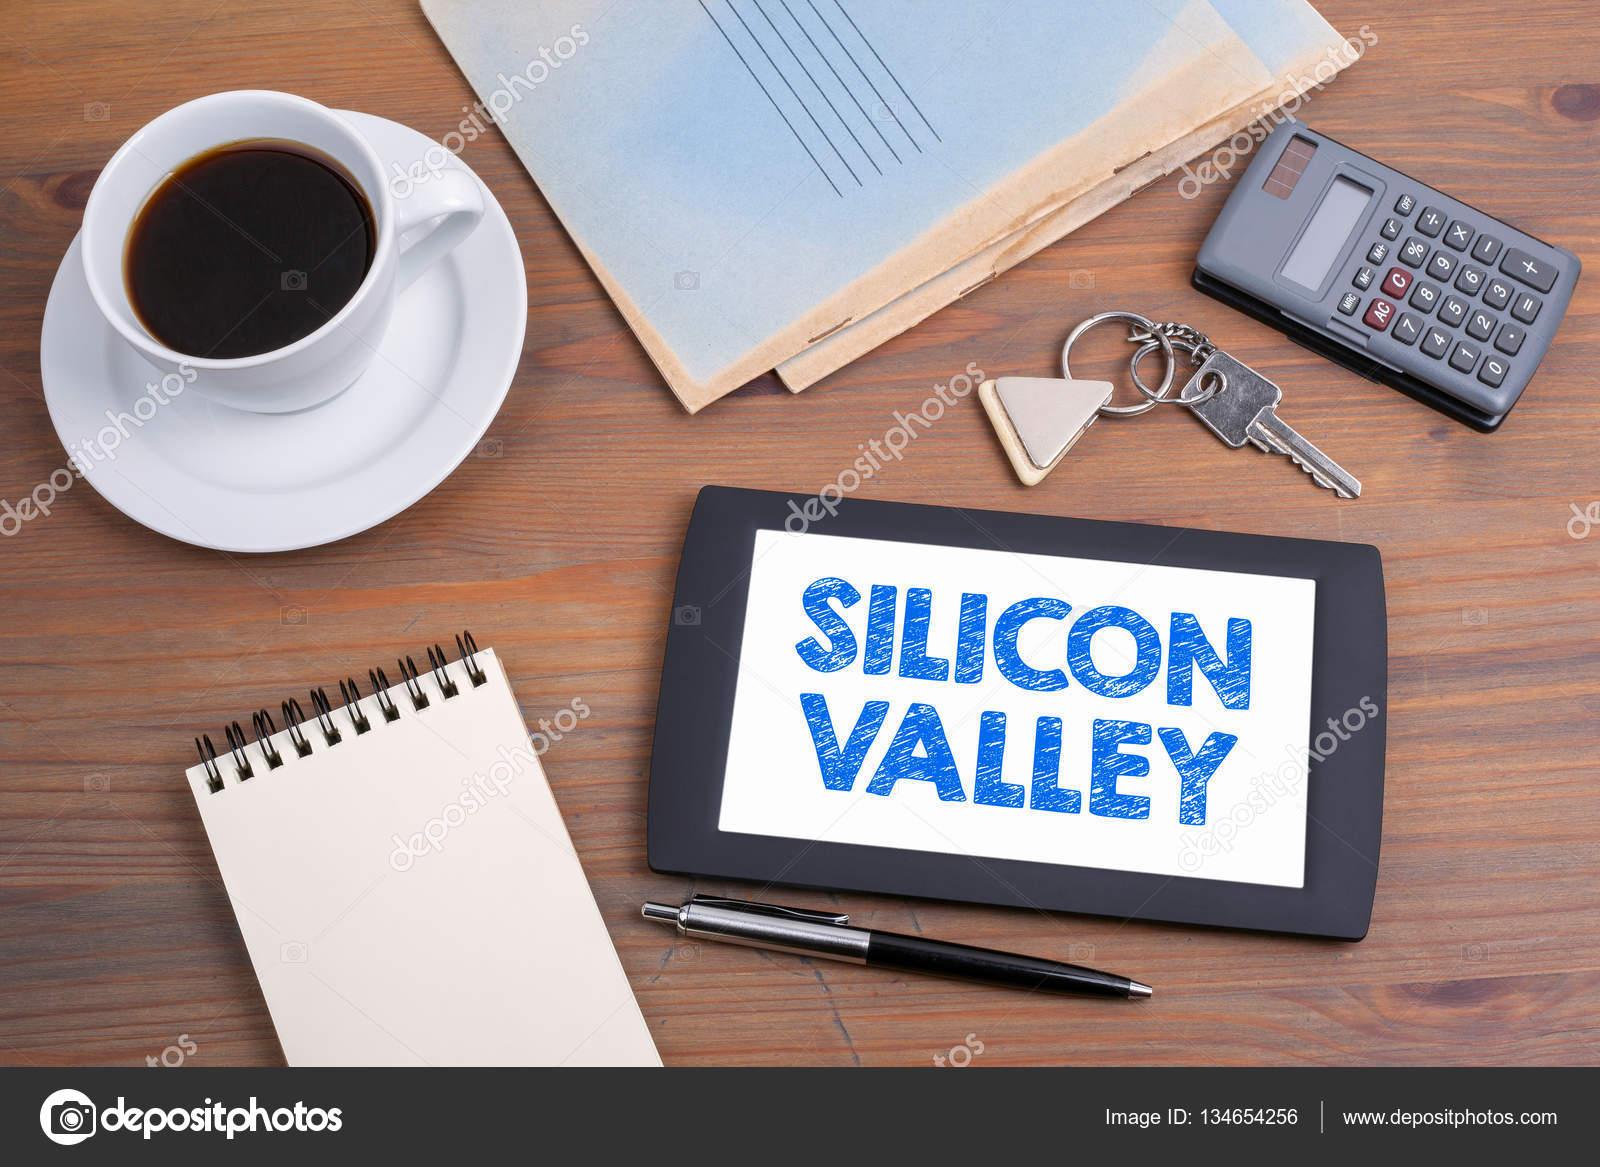 Silicon valley. vieux bureau en bois u2014 photographie tumsasedgars